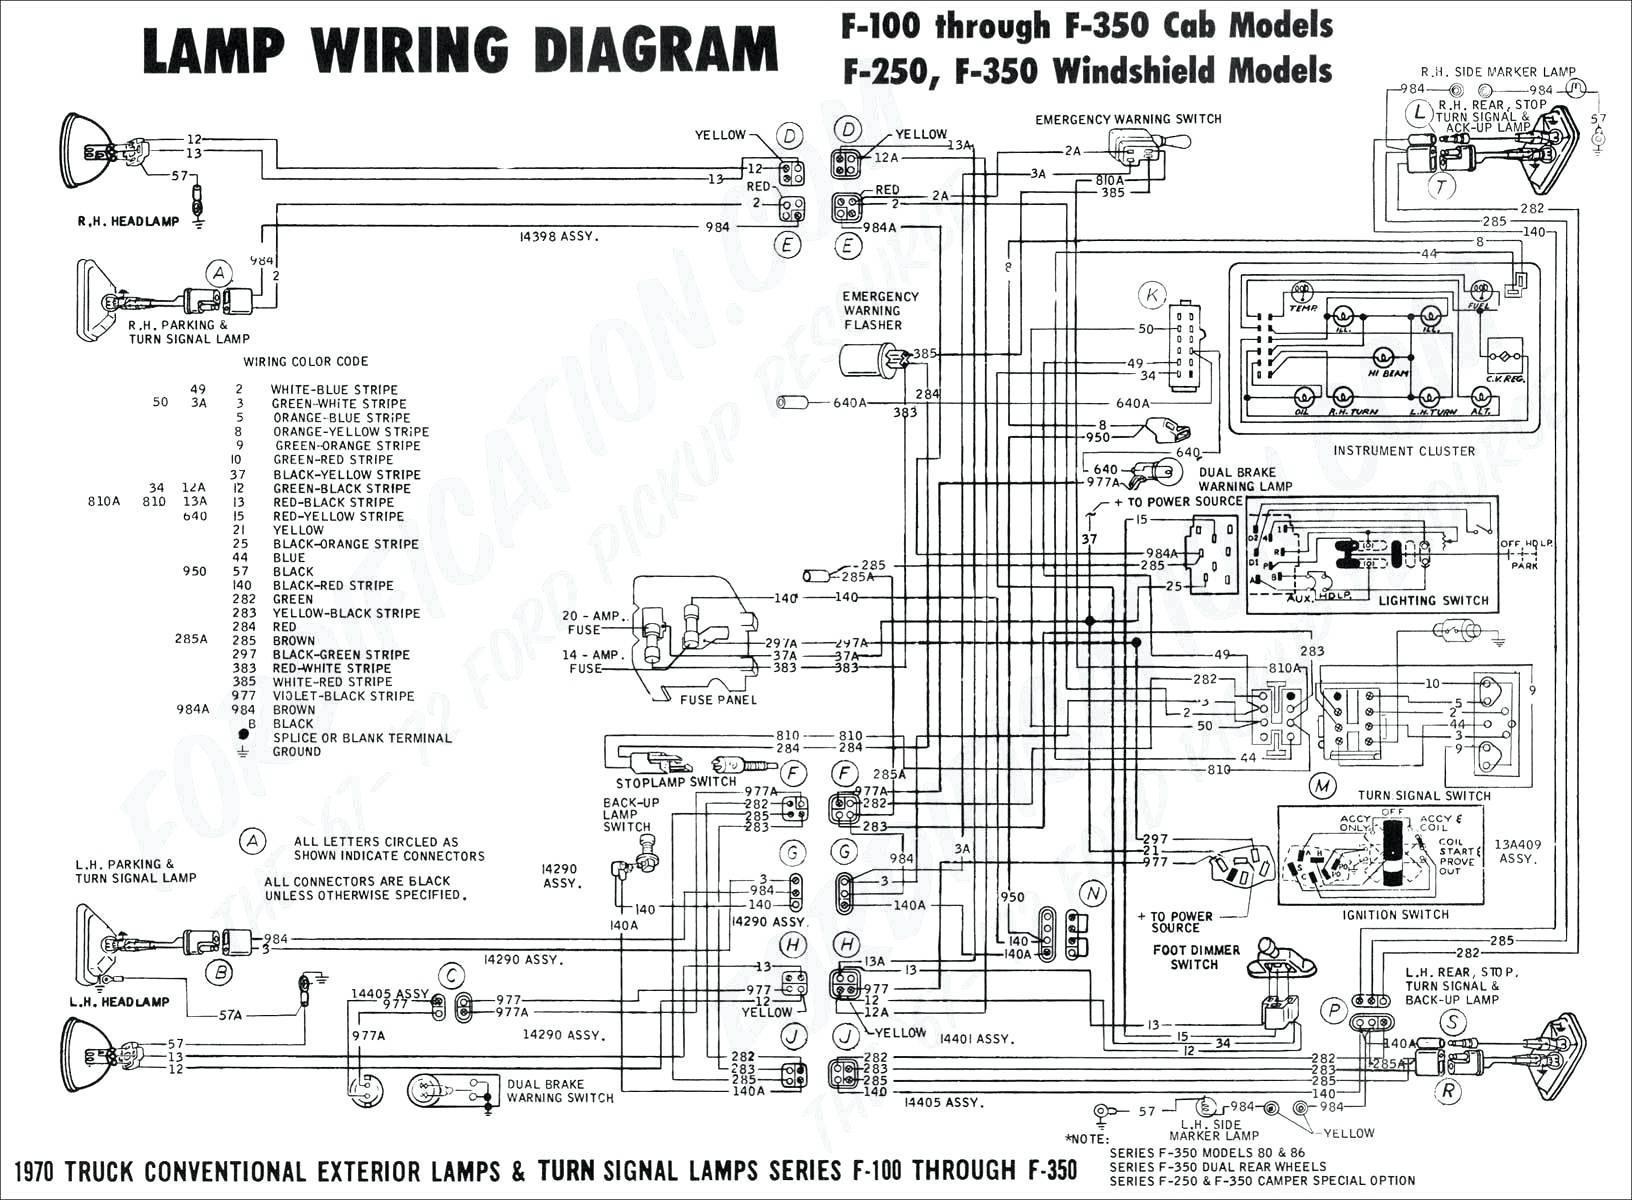 2009 ford fiesta wiring diagram